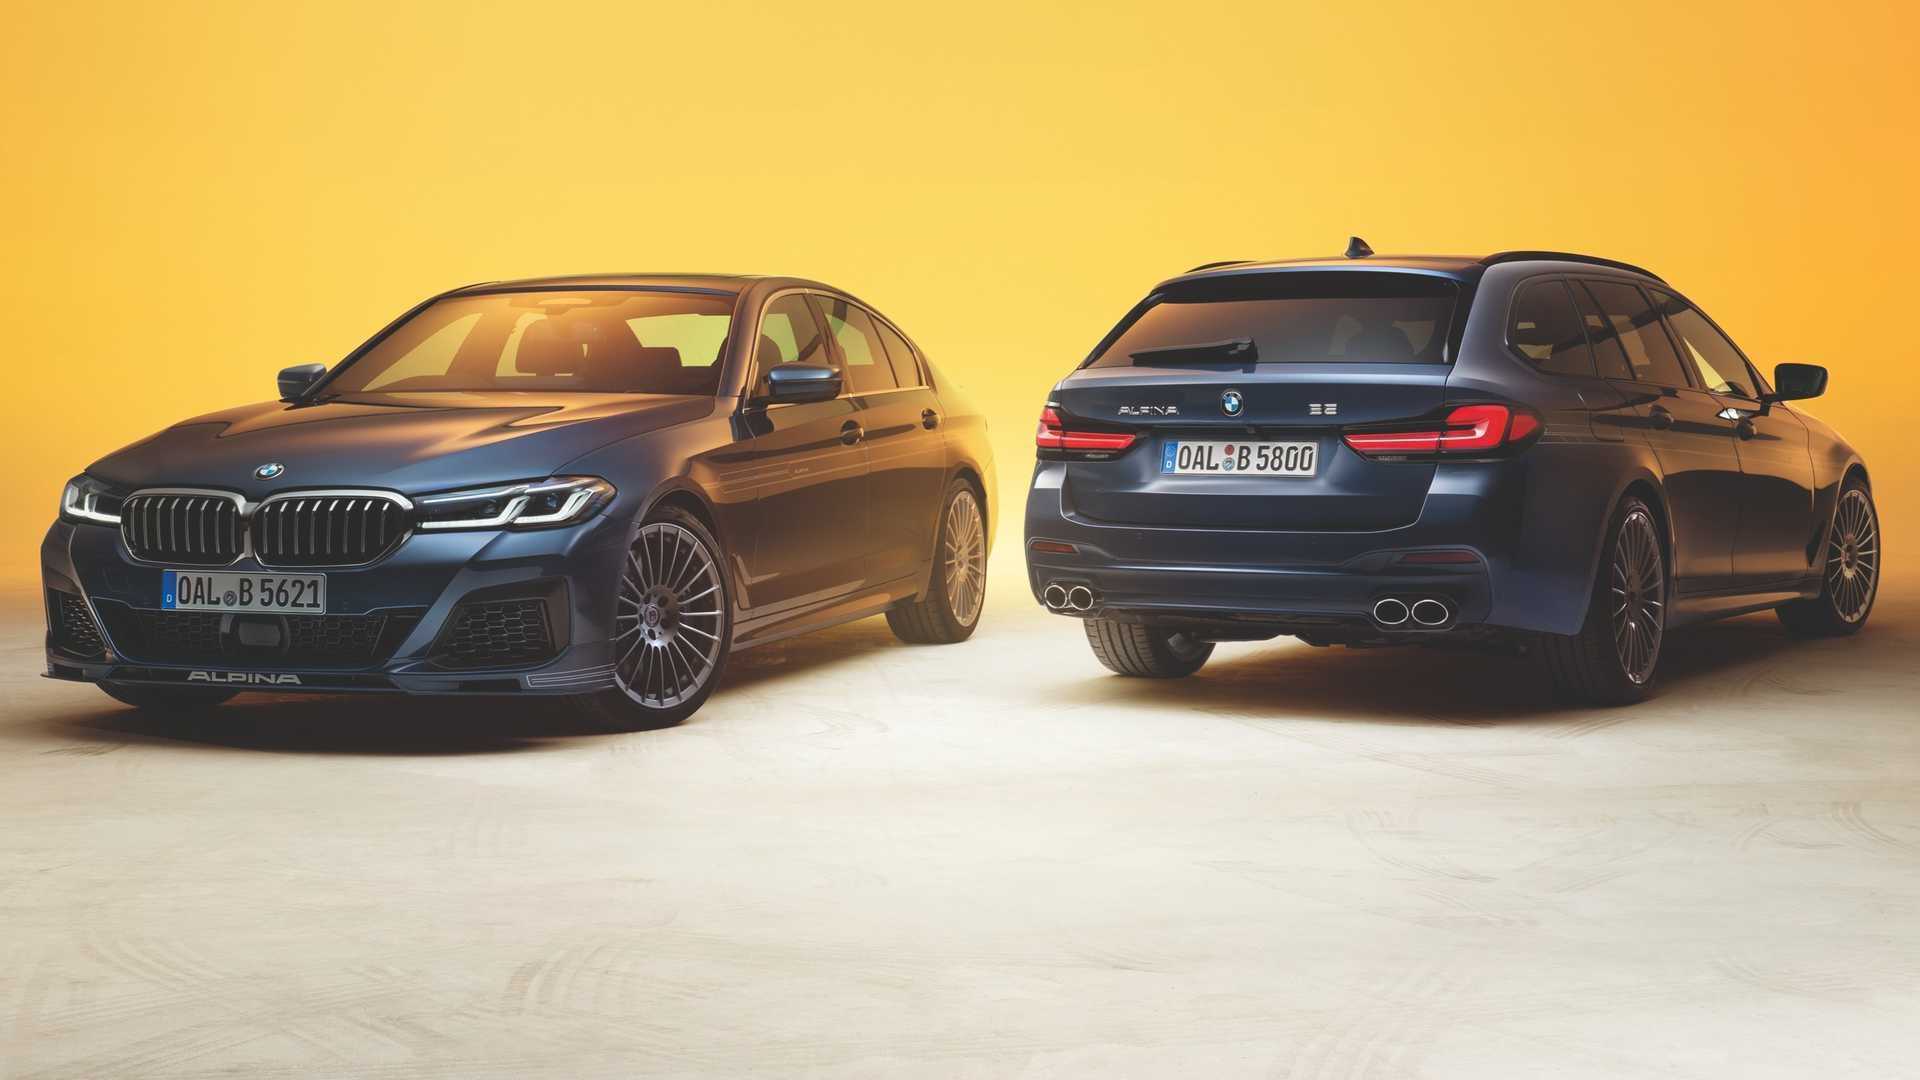 2021 BMW Alpina B5 and B5 Touring